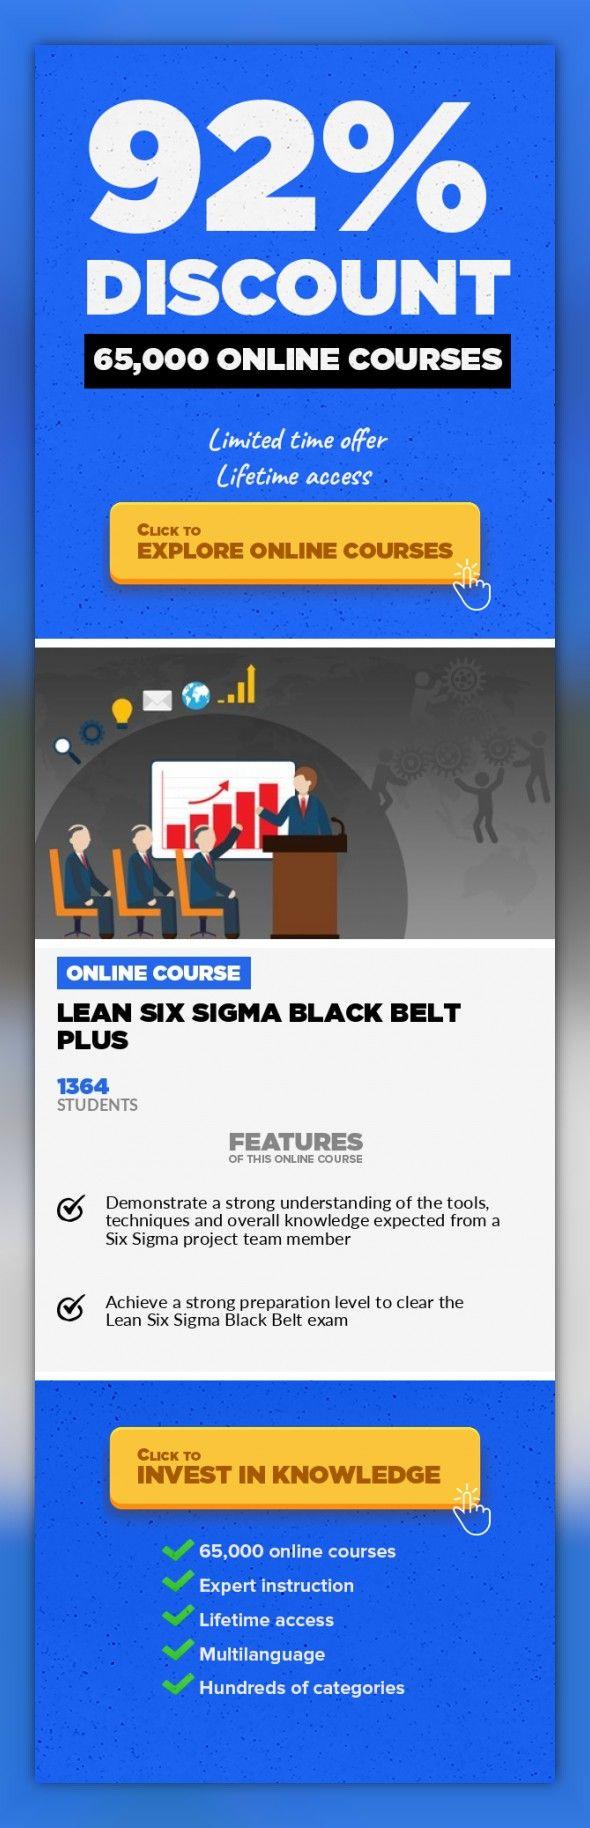 Lean Six Sigma Black Belt Plus Operations Business Onlinecourses